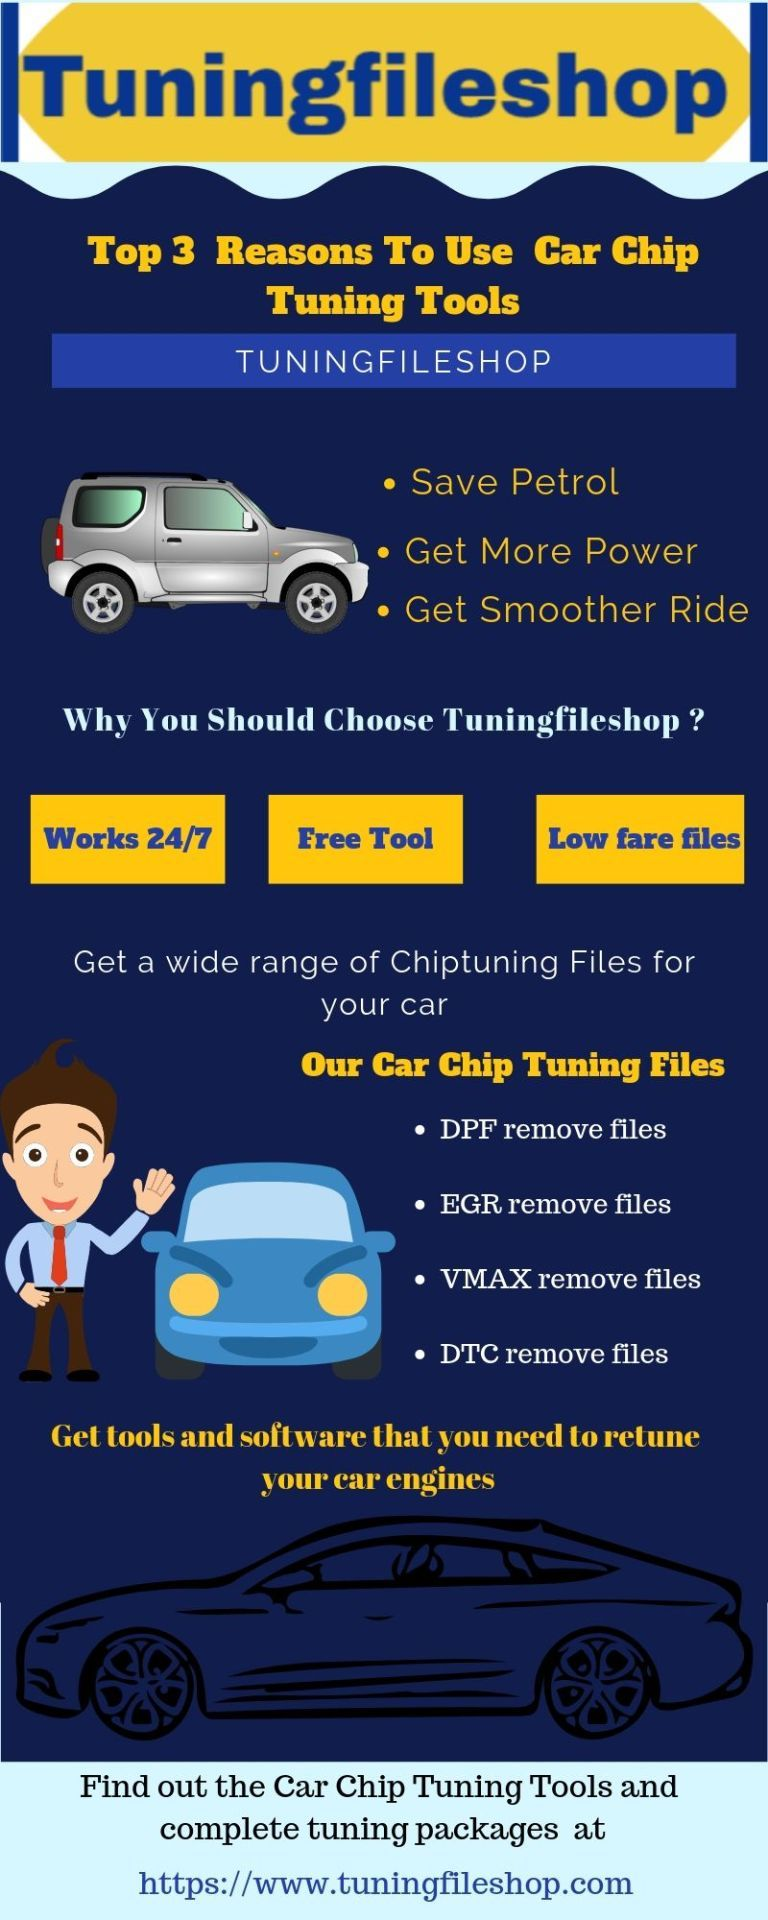 4c8e64ebf15ae5c298e90bb62e75c6c5 - How Much Is It To Get Your Car Tuned